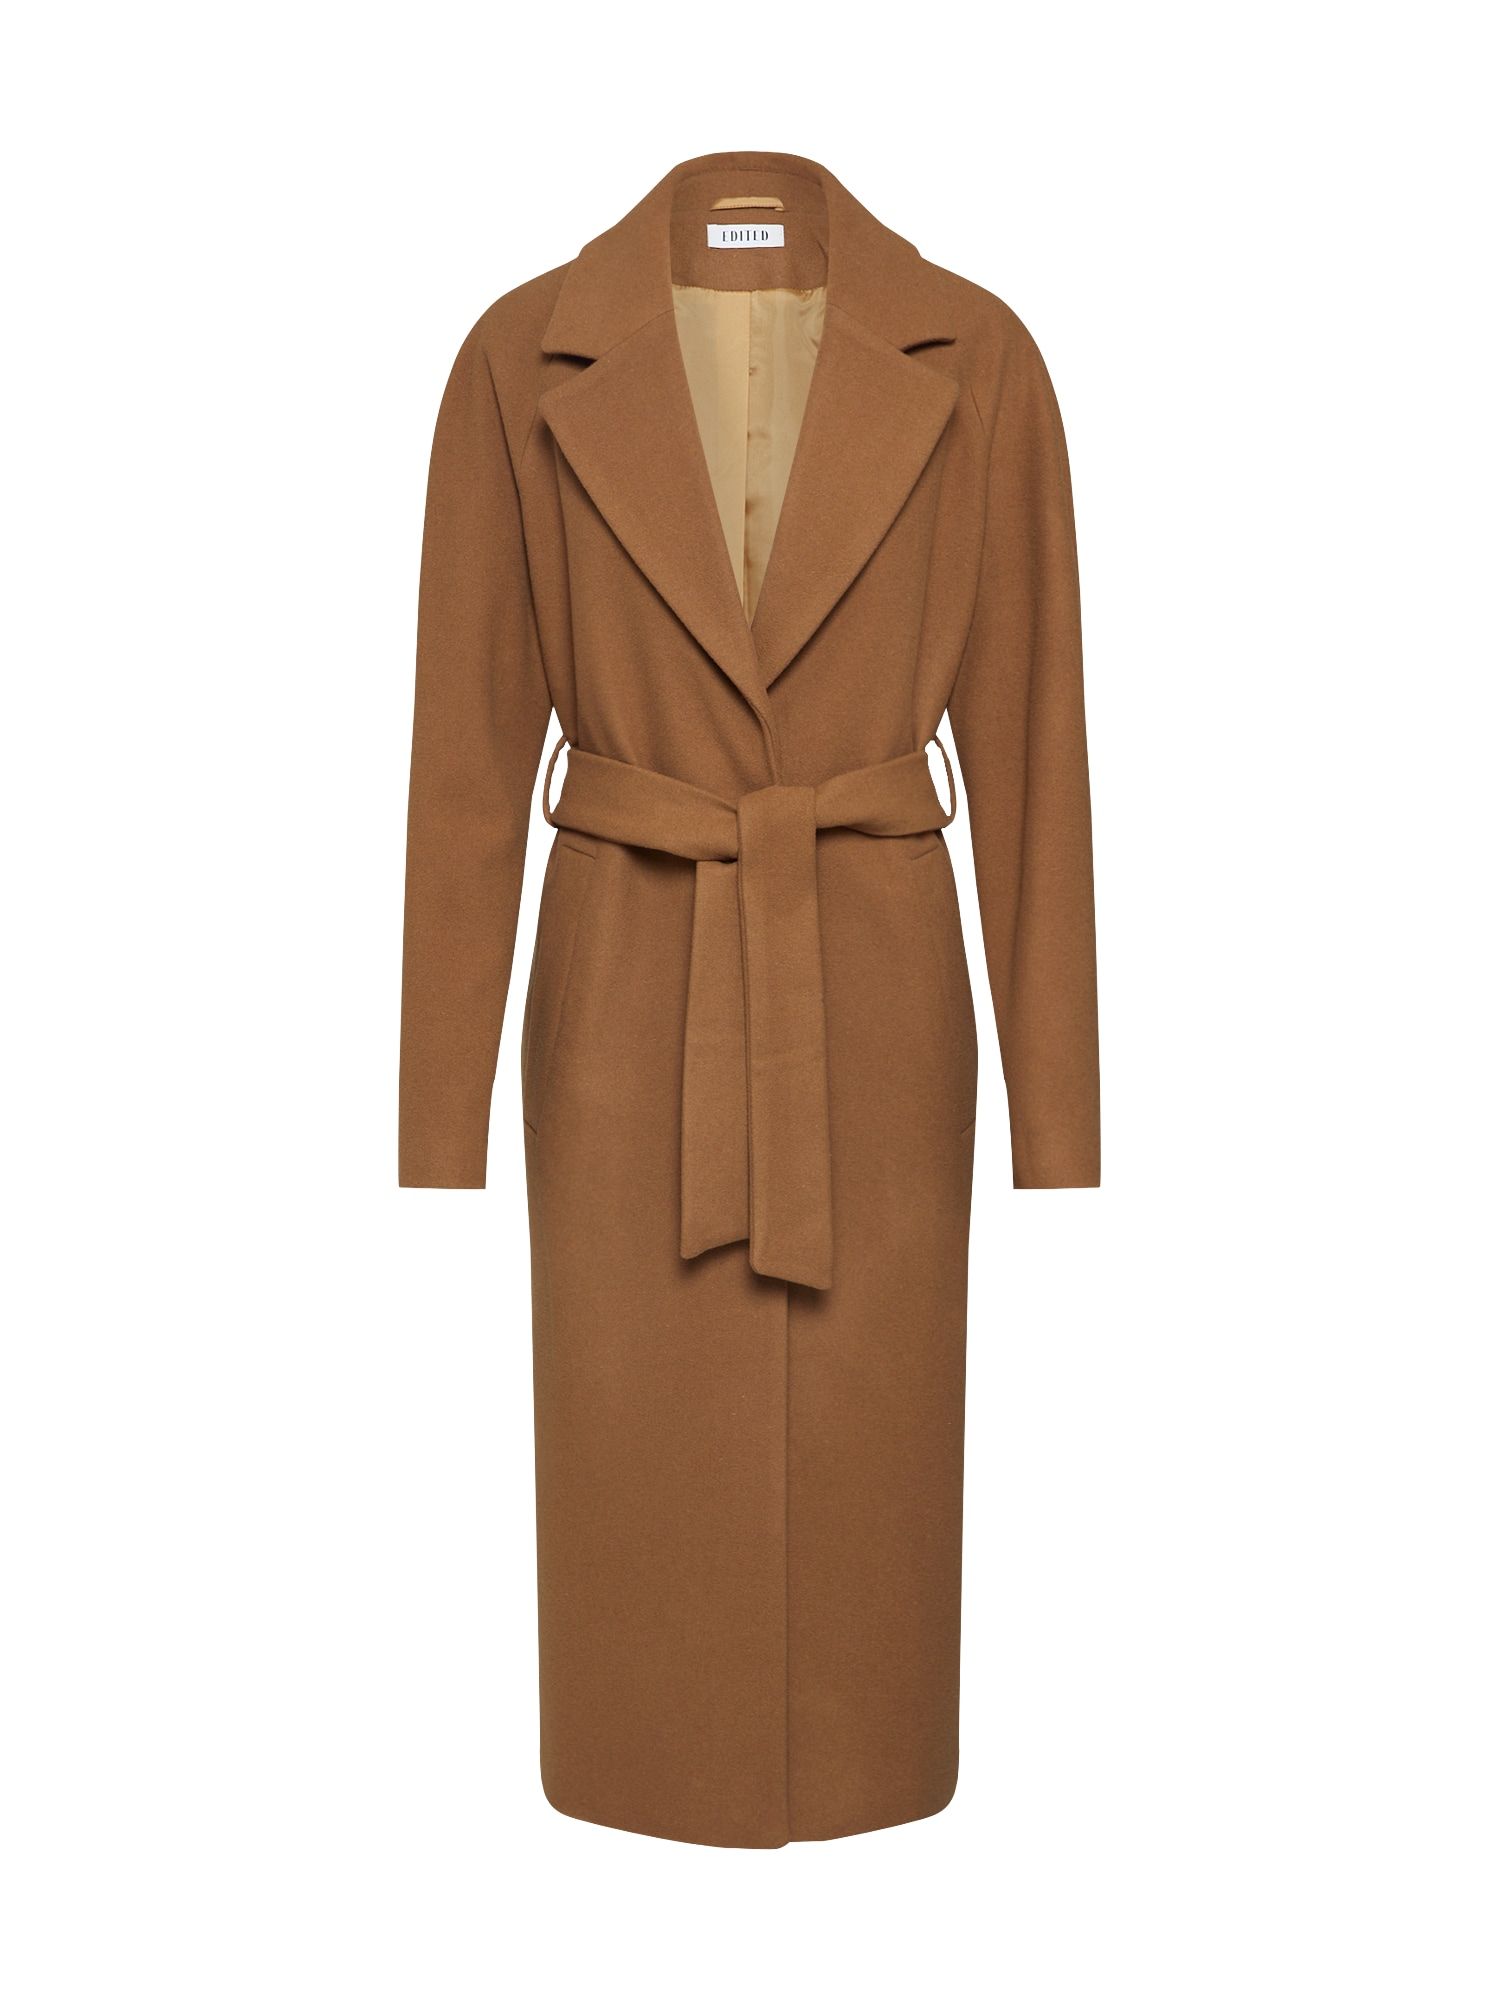 EDITED Rudeninis-žieminis paltas 'Cecilia' ruda / kupranugario